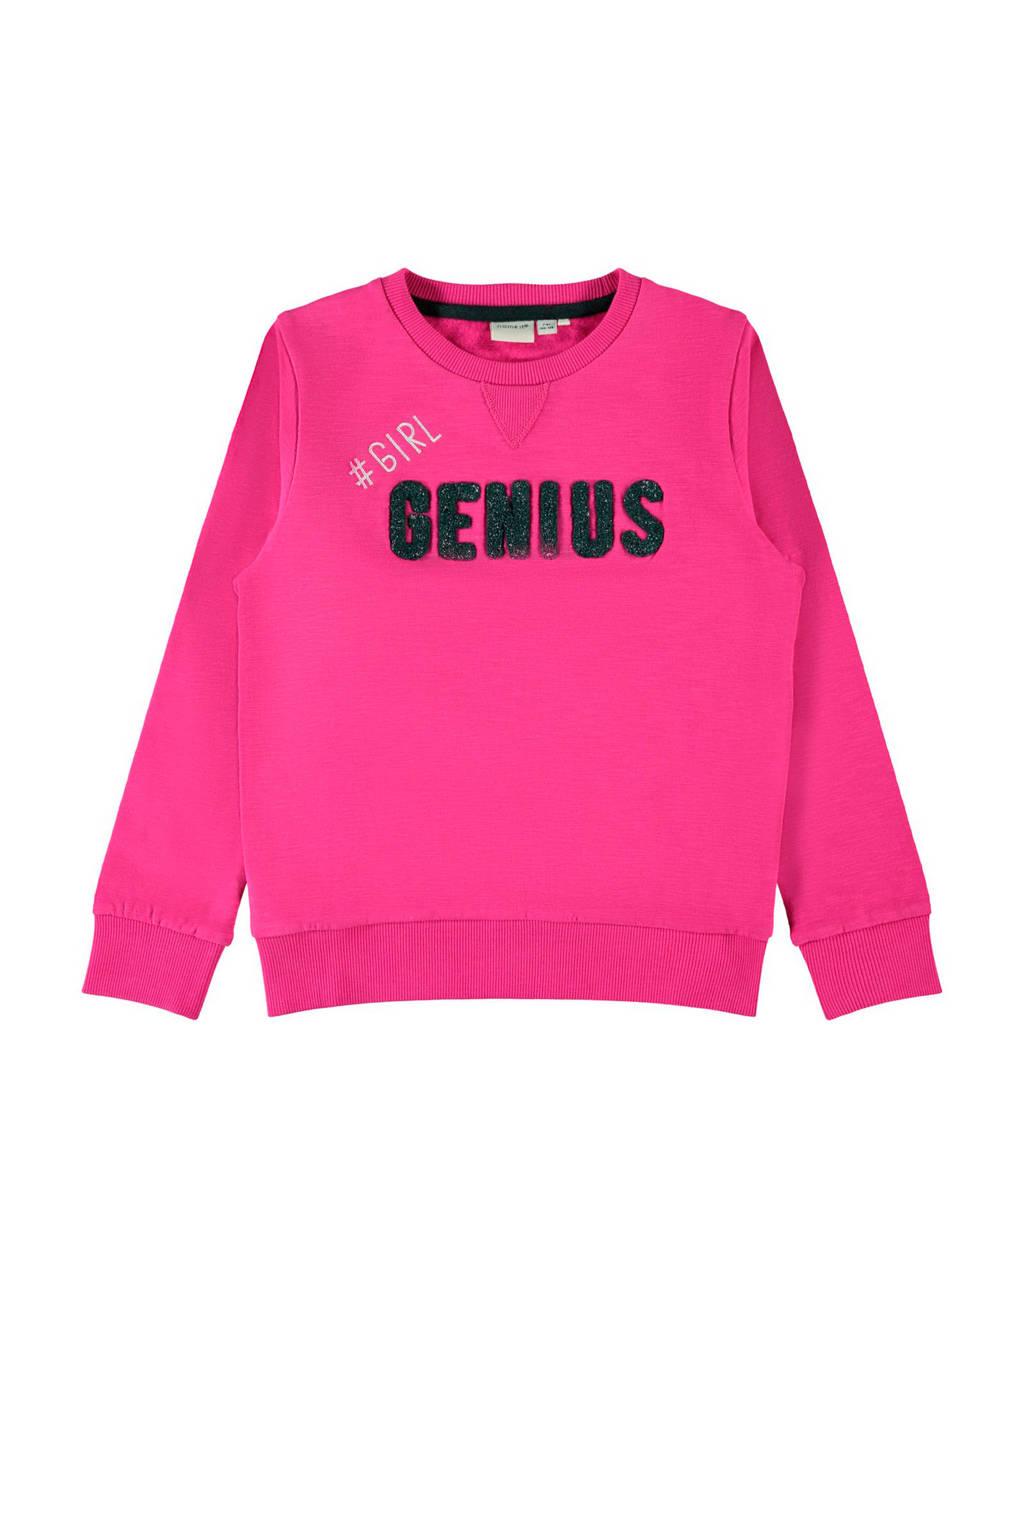 NAME IT KIDS sweater Nielsine met borduursels fuchsia, Fuchsia